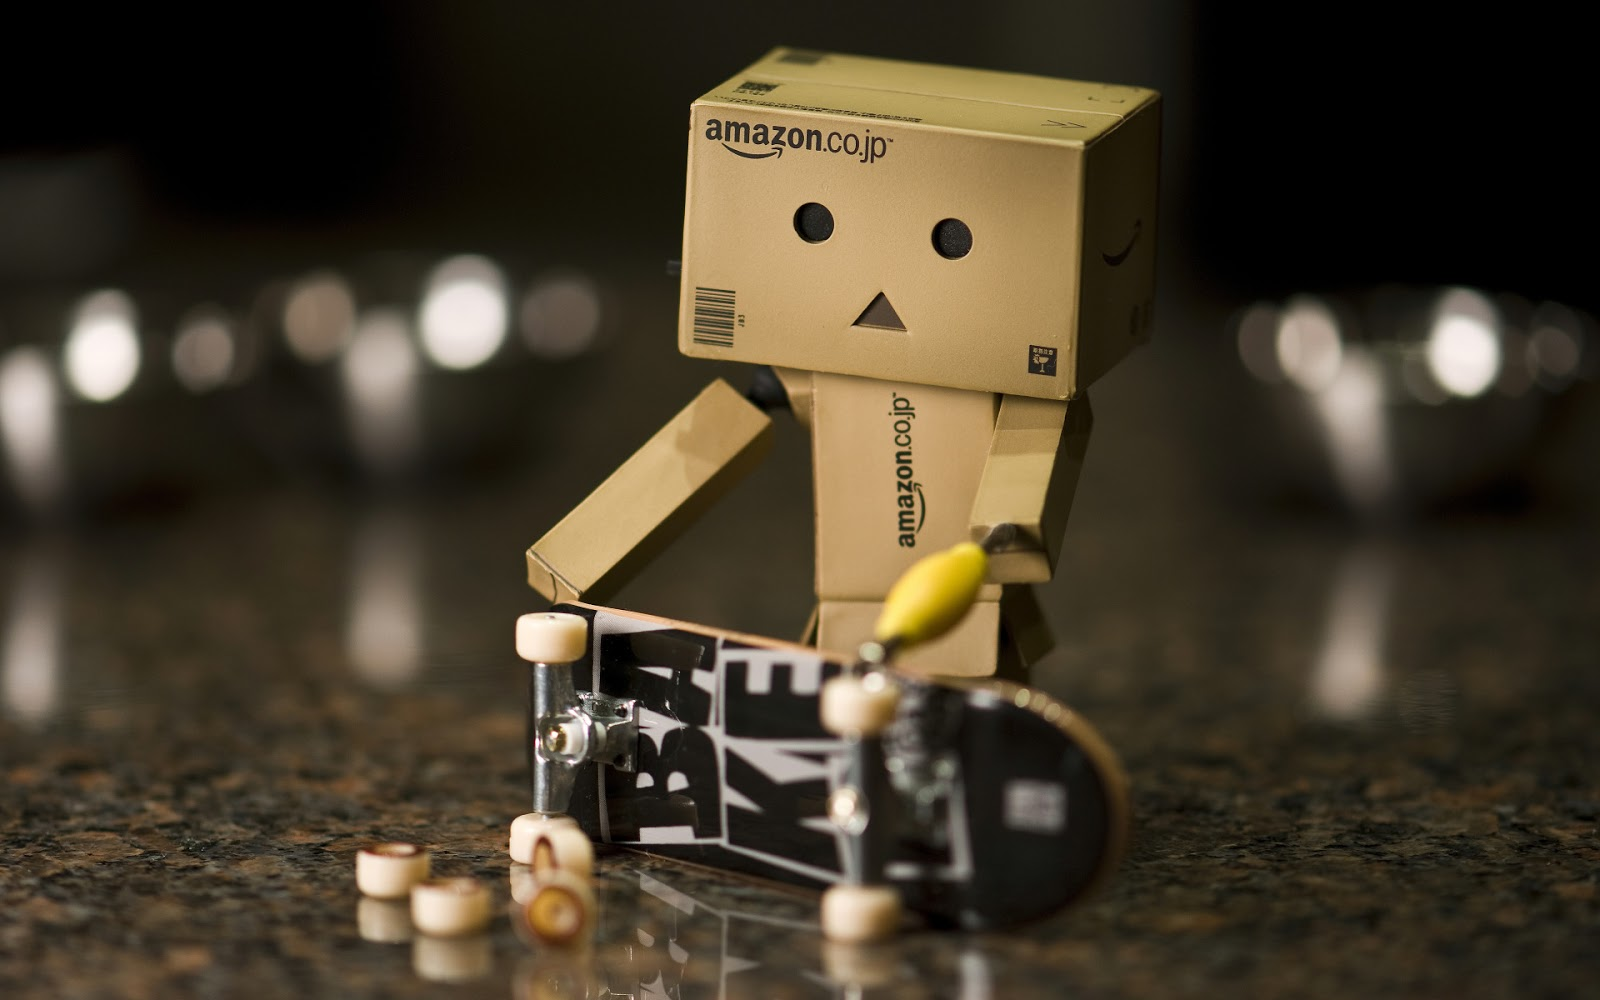 Danbo Jr. assembling a skateboard